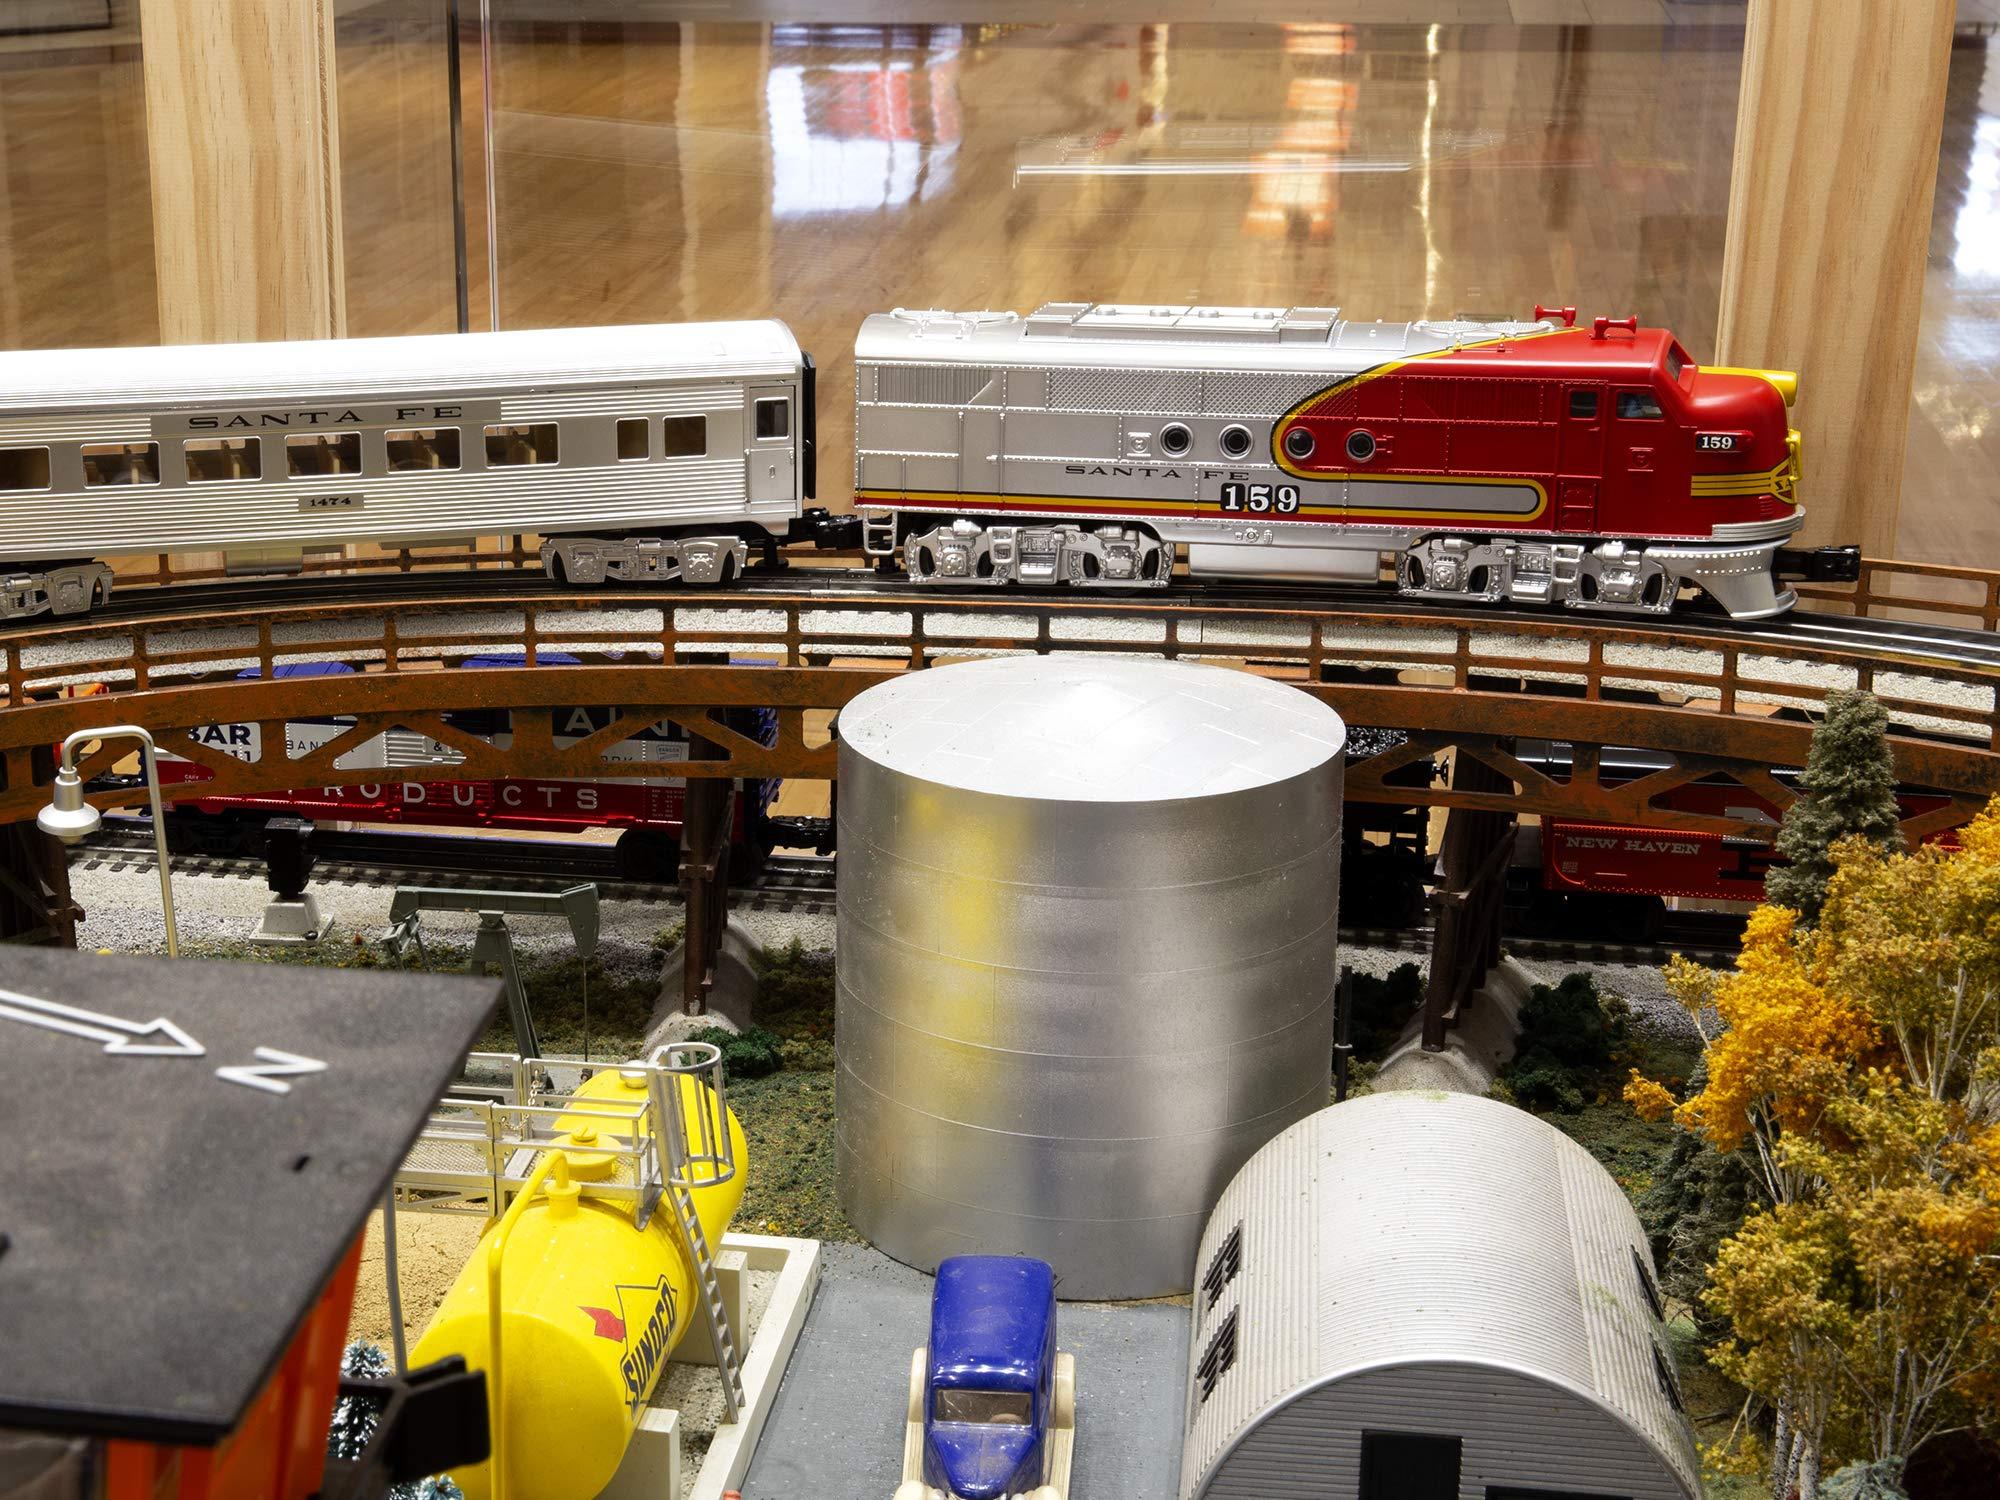 Lionel Santa Fe Super Chief Electric O Gauge Model Train Set w/ Remote and Bluetooth Capability by Lionel (Image #5)